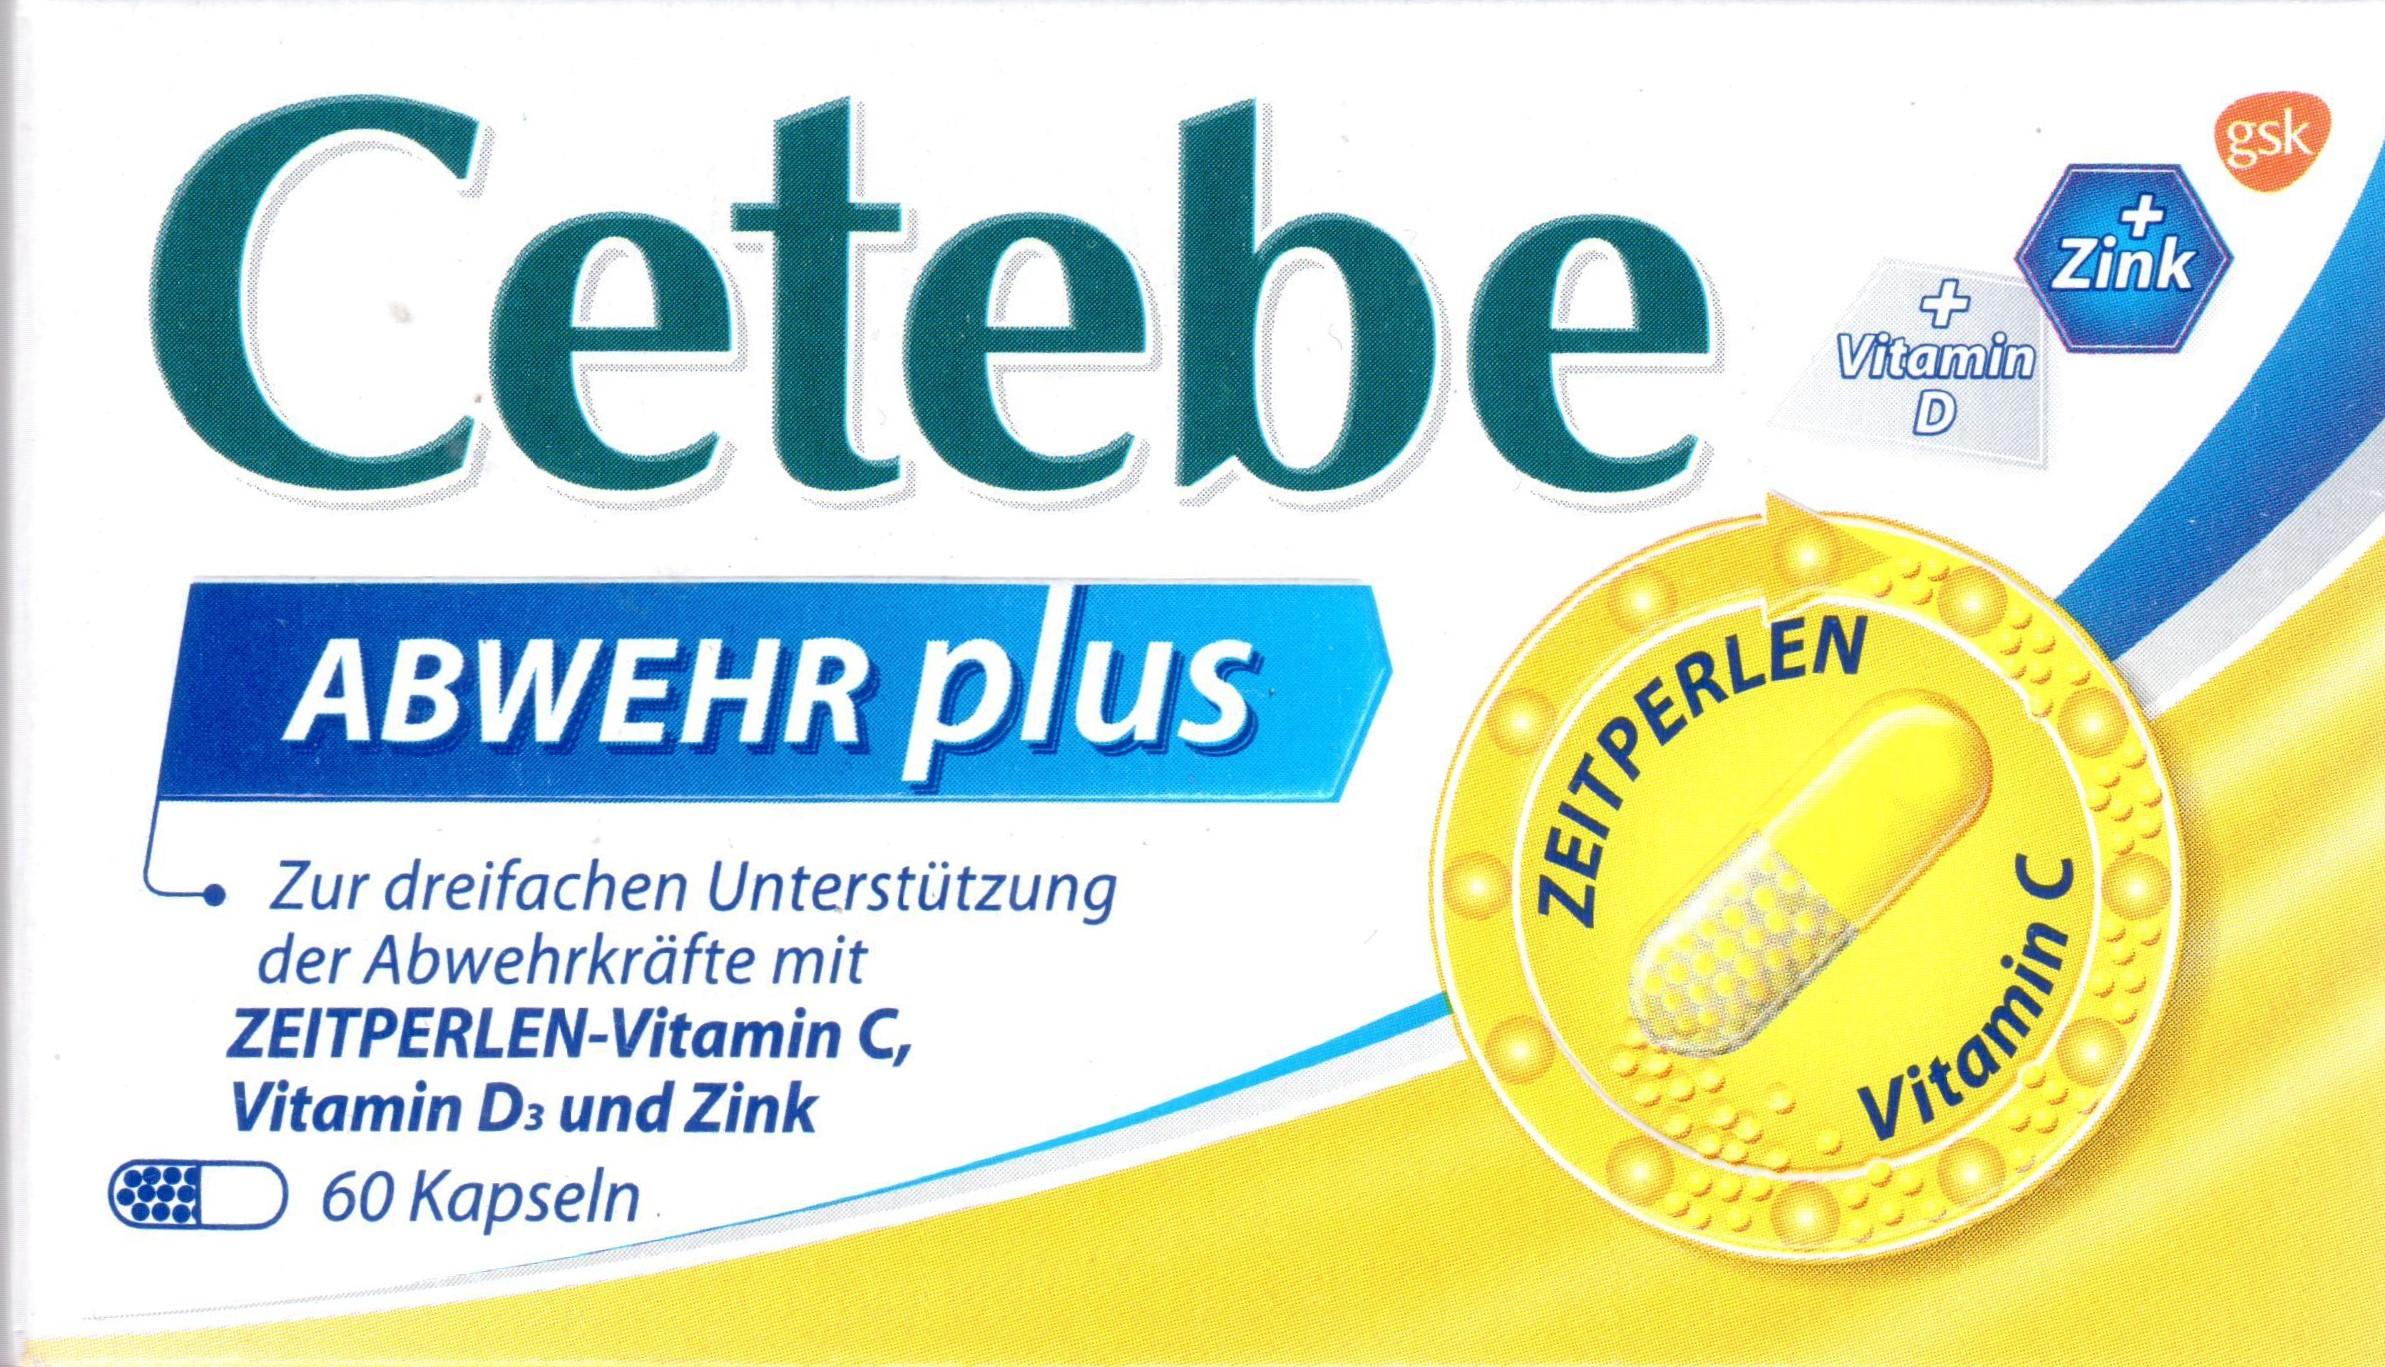 Cetebe Abwehr plus 30 St PZN: 02408188 Immun